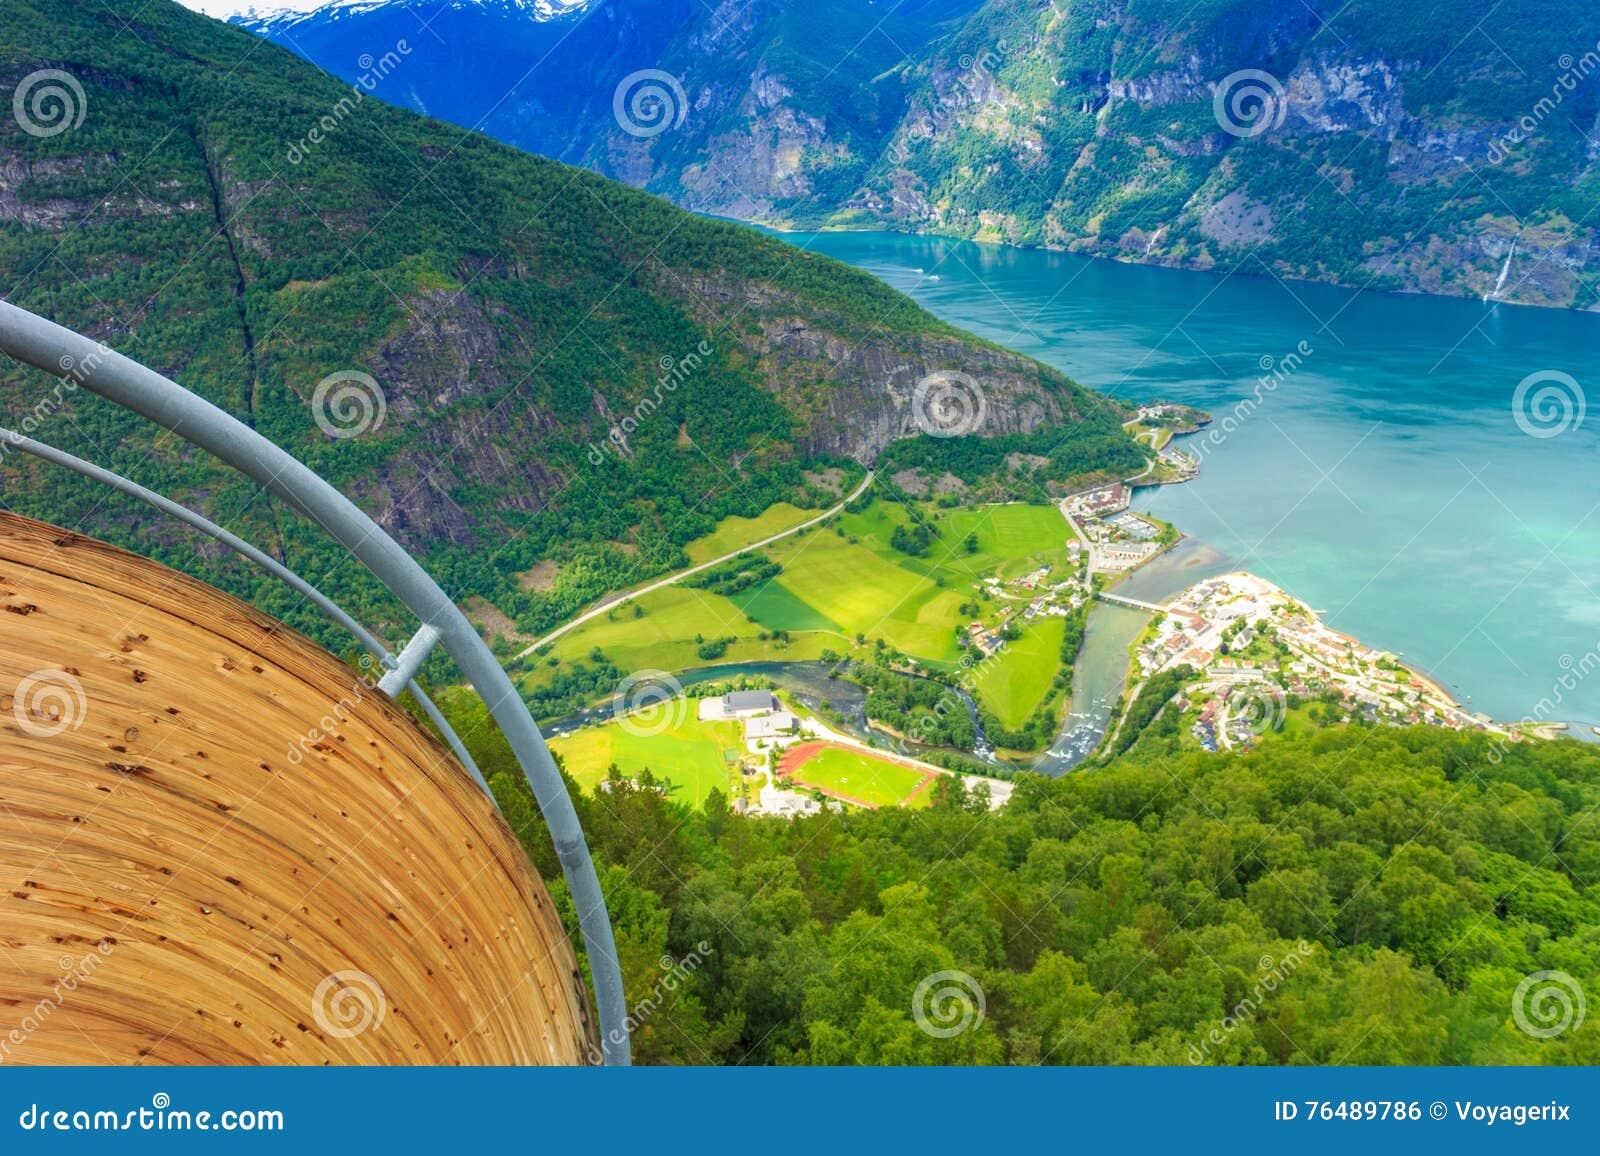 vue des fjords au point de vue de stegastein en norv ge photo stock image 76489786. Black Bedroom Furniture Sets. Home Design Ideas